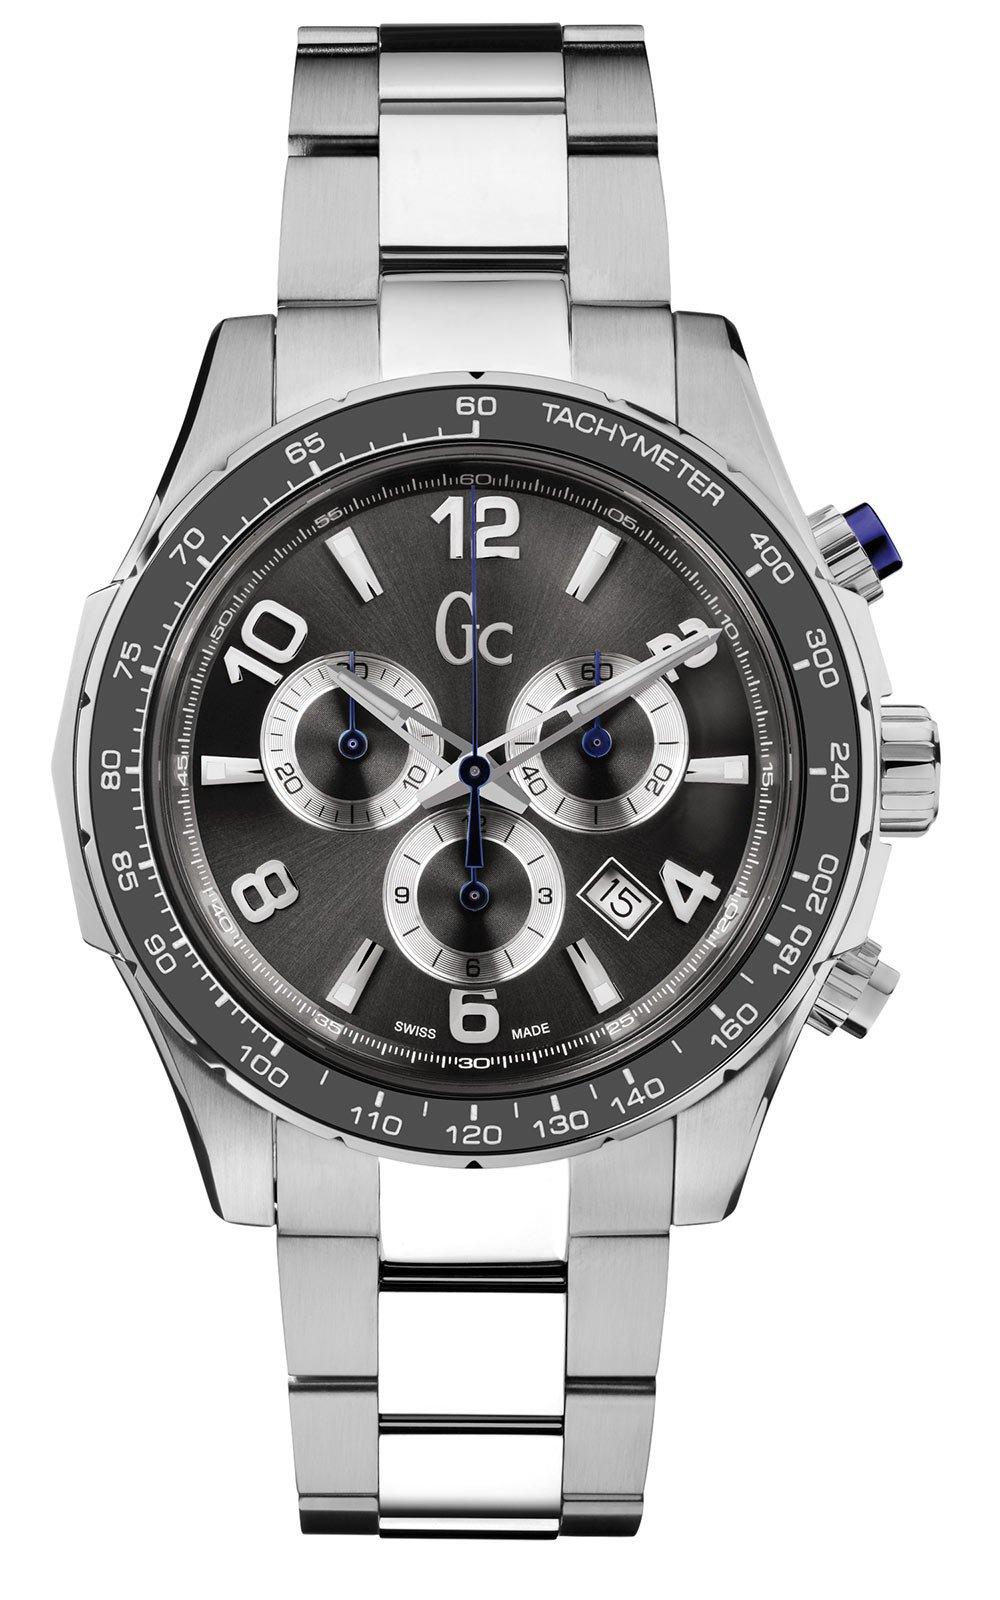 GC X51002G5S Ανδρικό Ρολόι Quartz Χρονογράφος Ακριβείας 7c1d5a97543